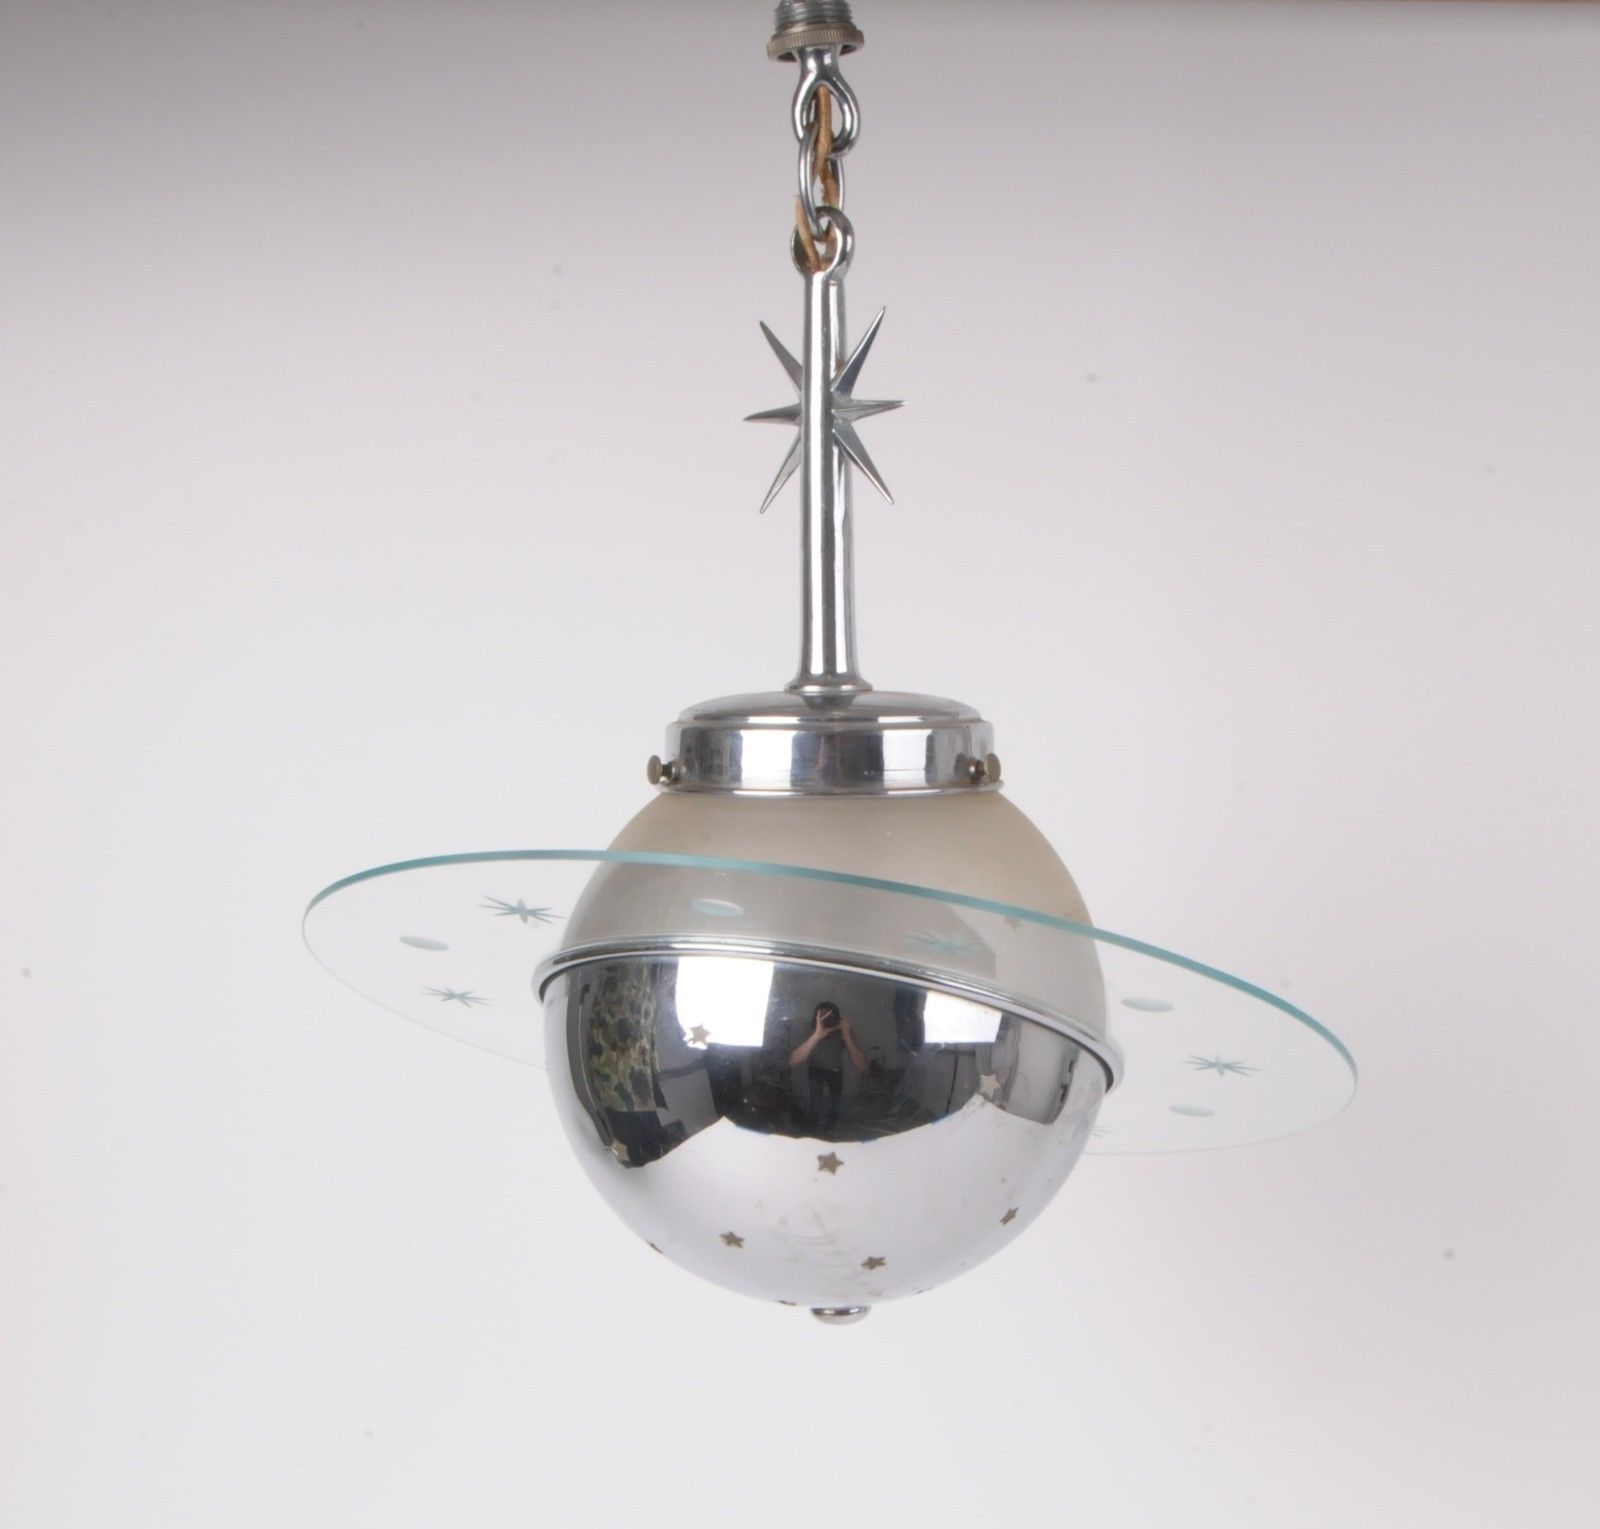 ceiling language tarnowski en division yrandol art ceilings lampy deco tarnowskidivision lamps light